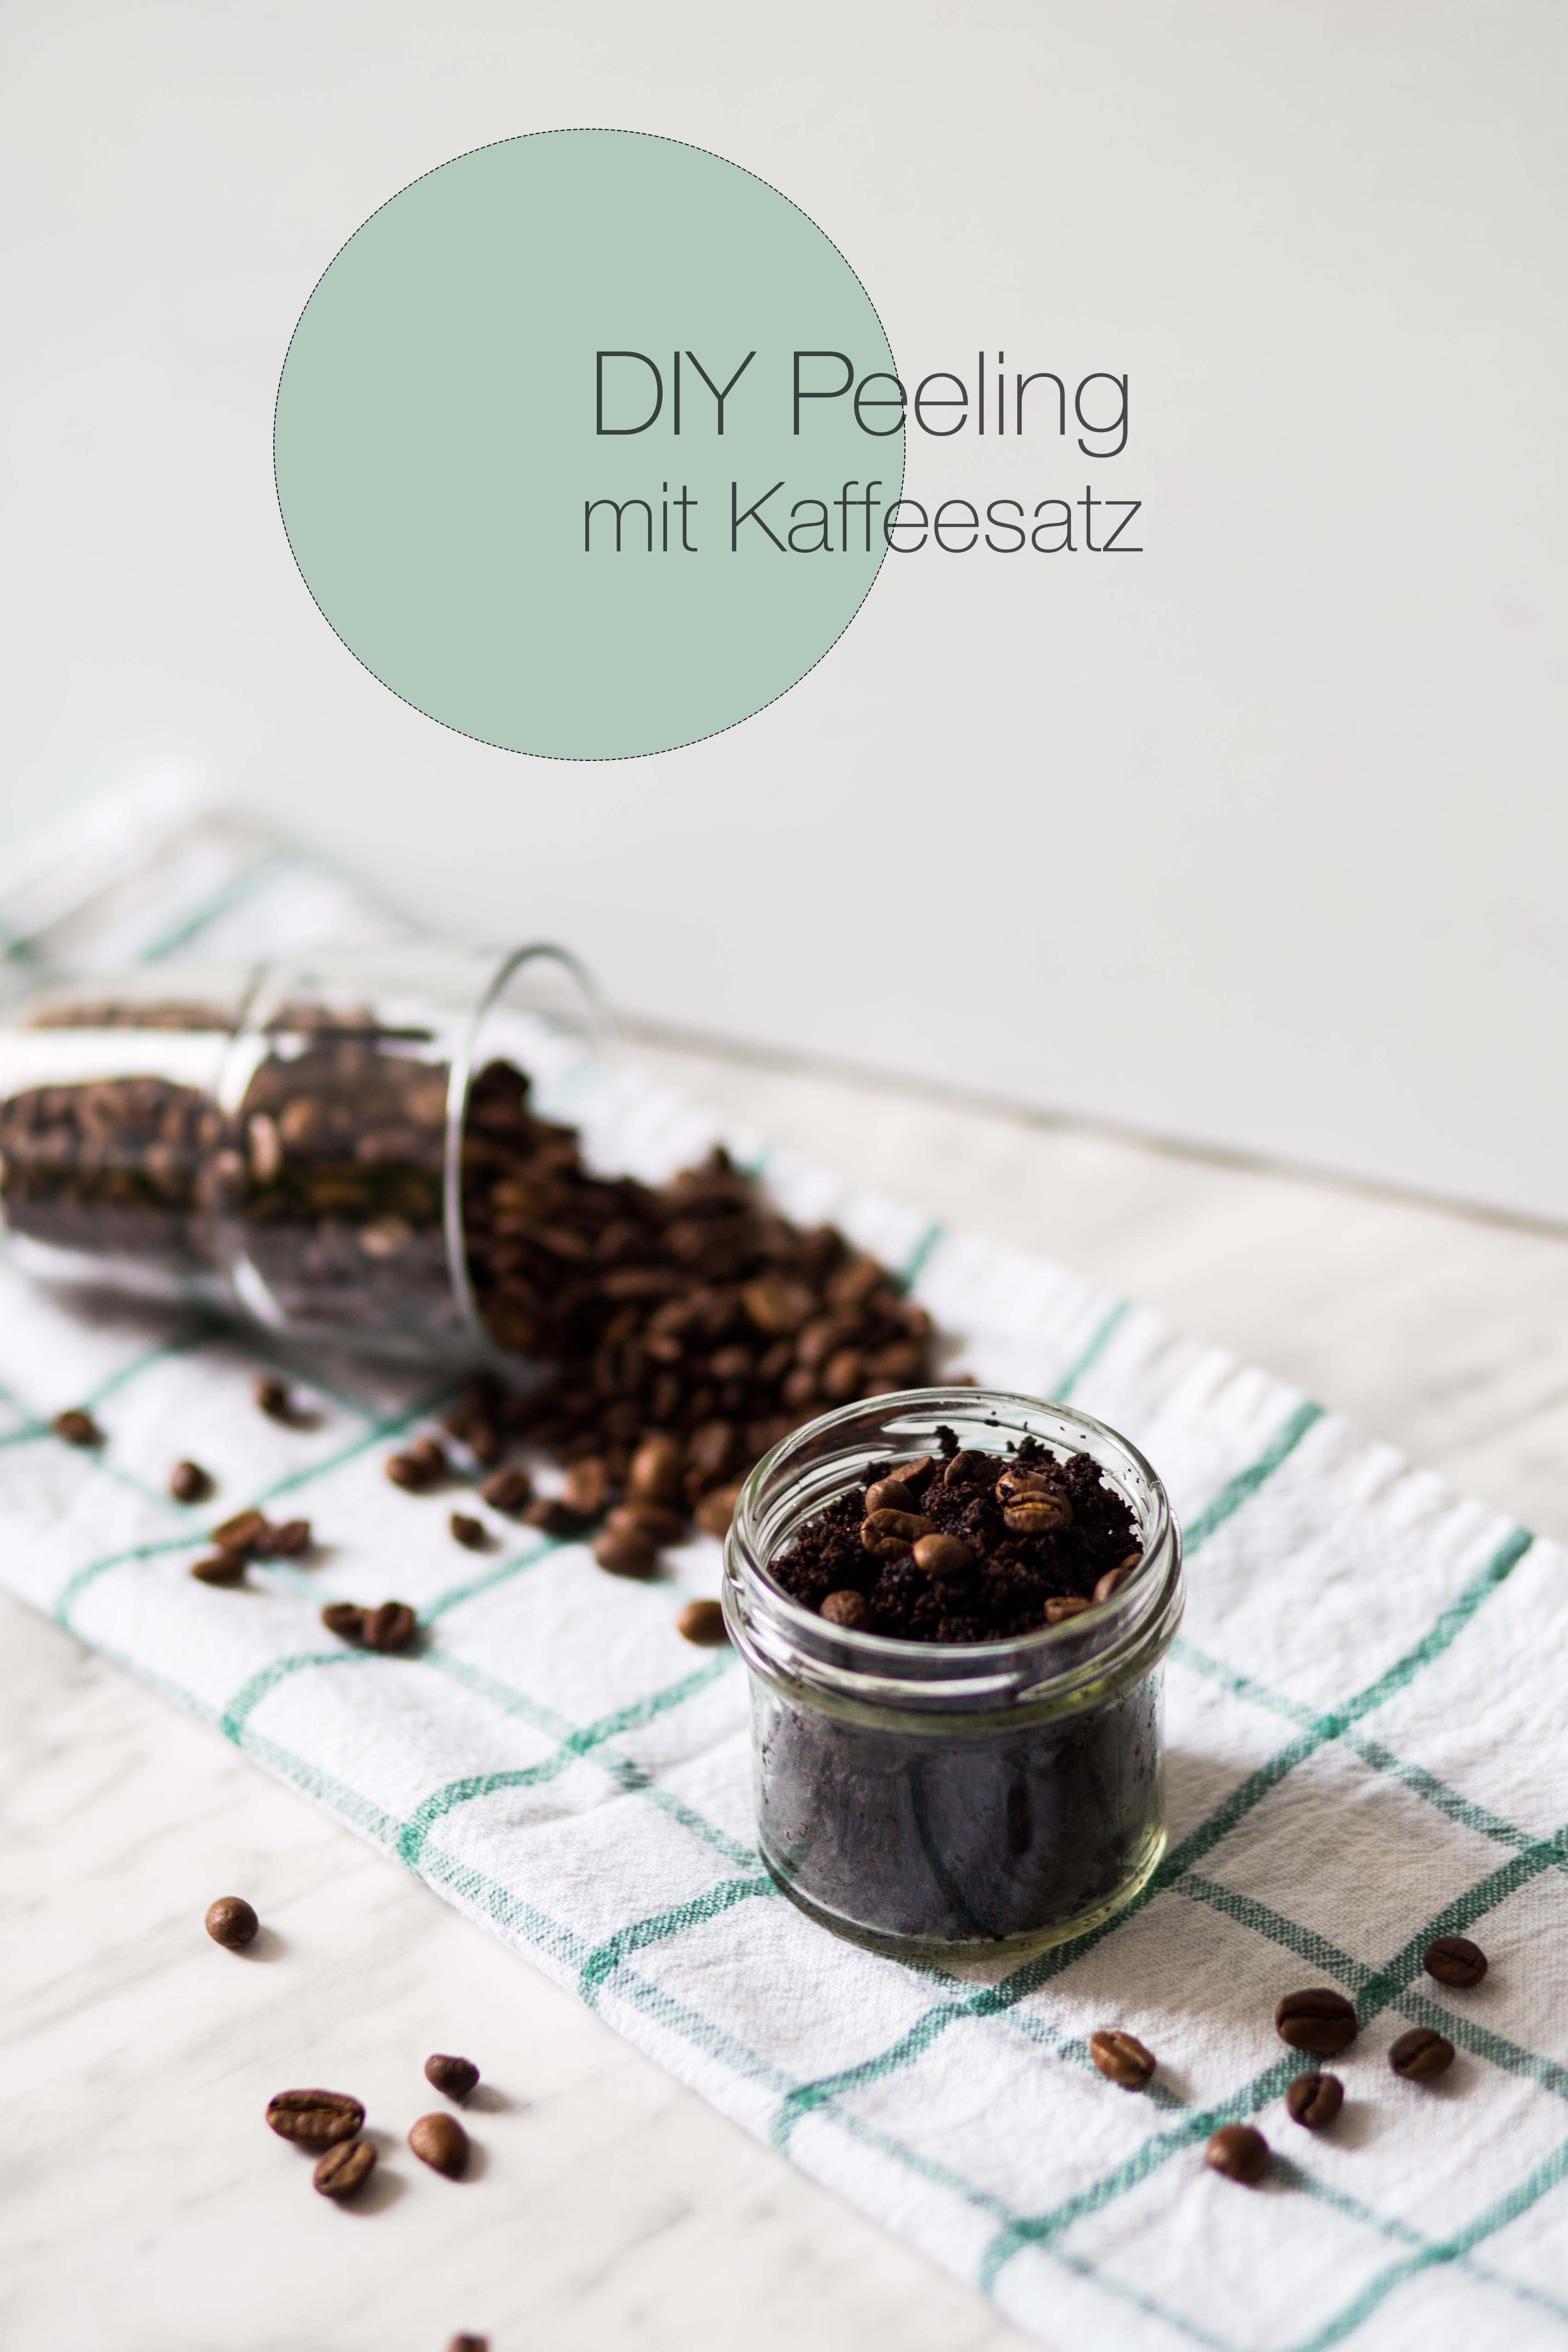 DIY Peeling mit Kaffeesatz